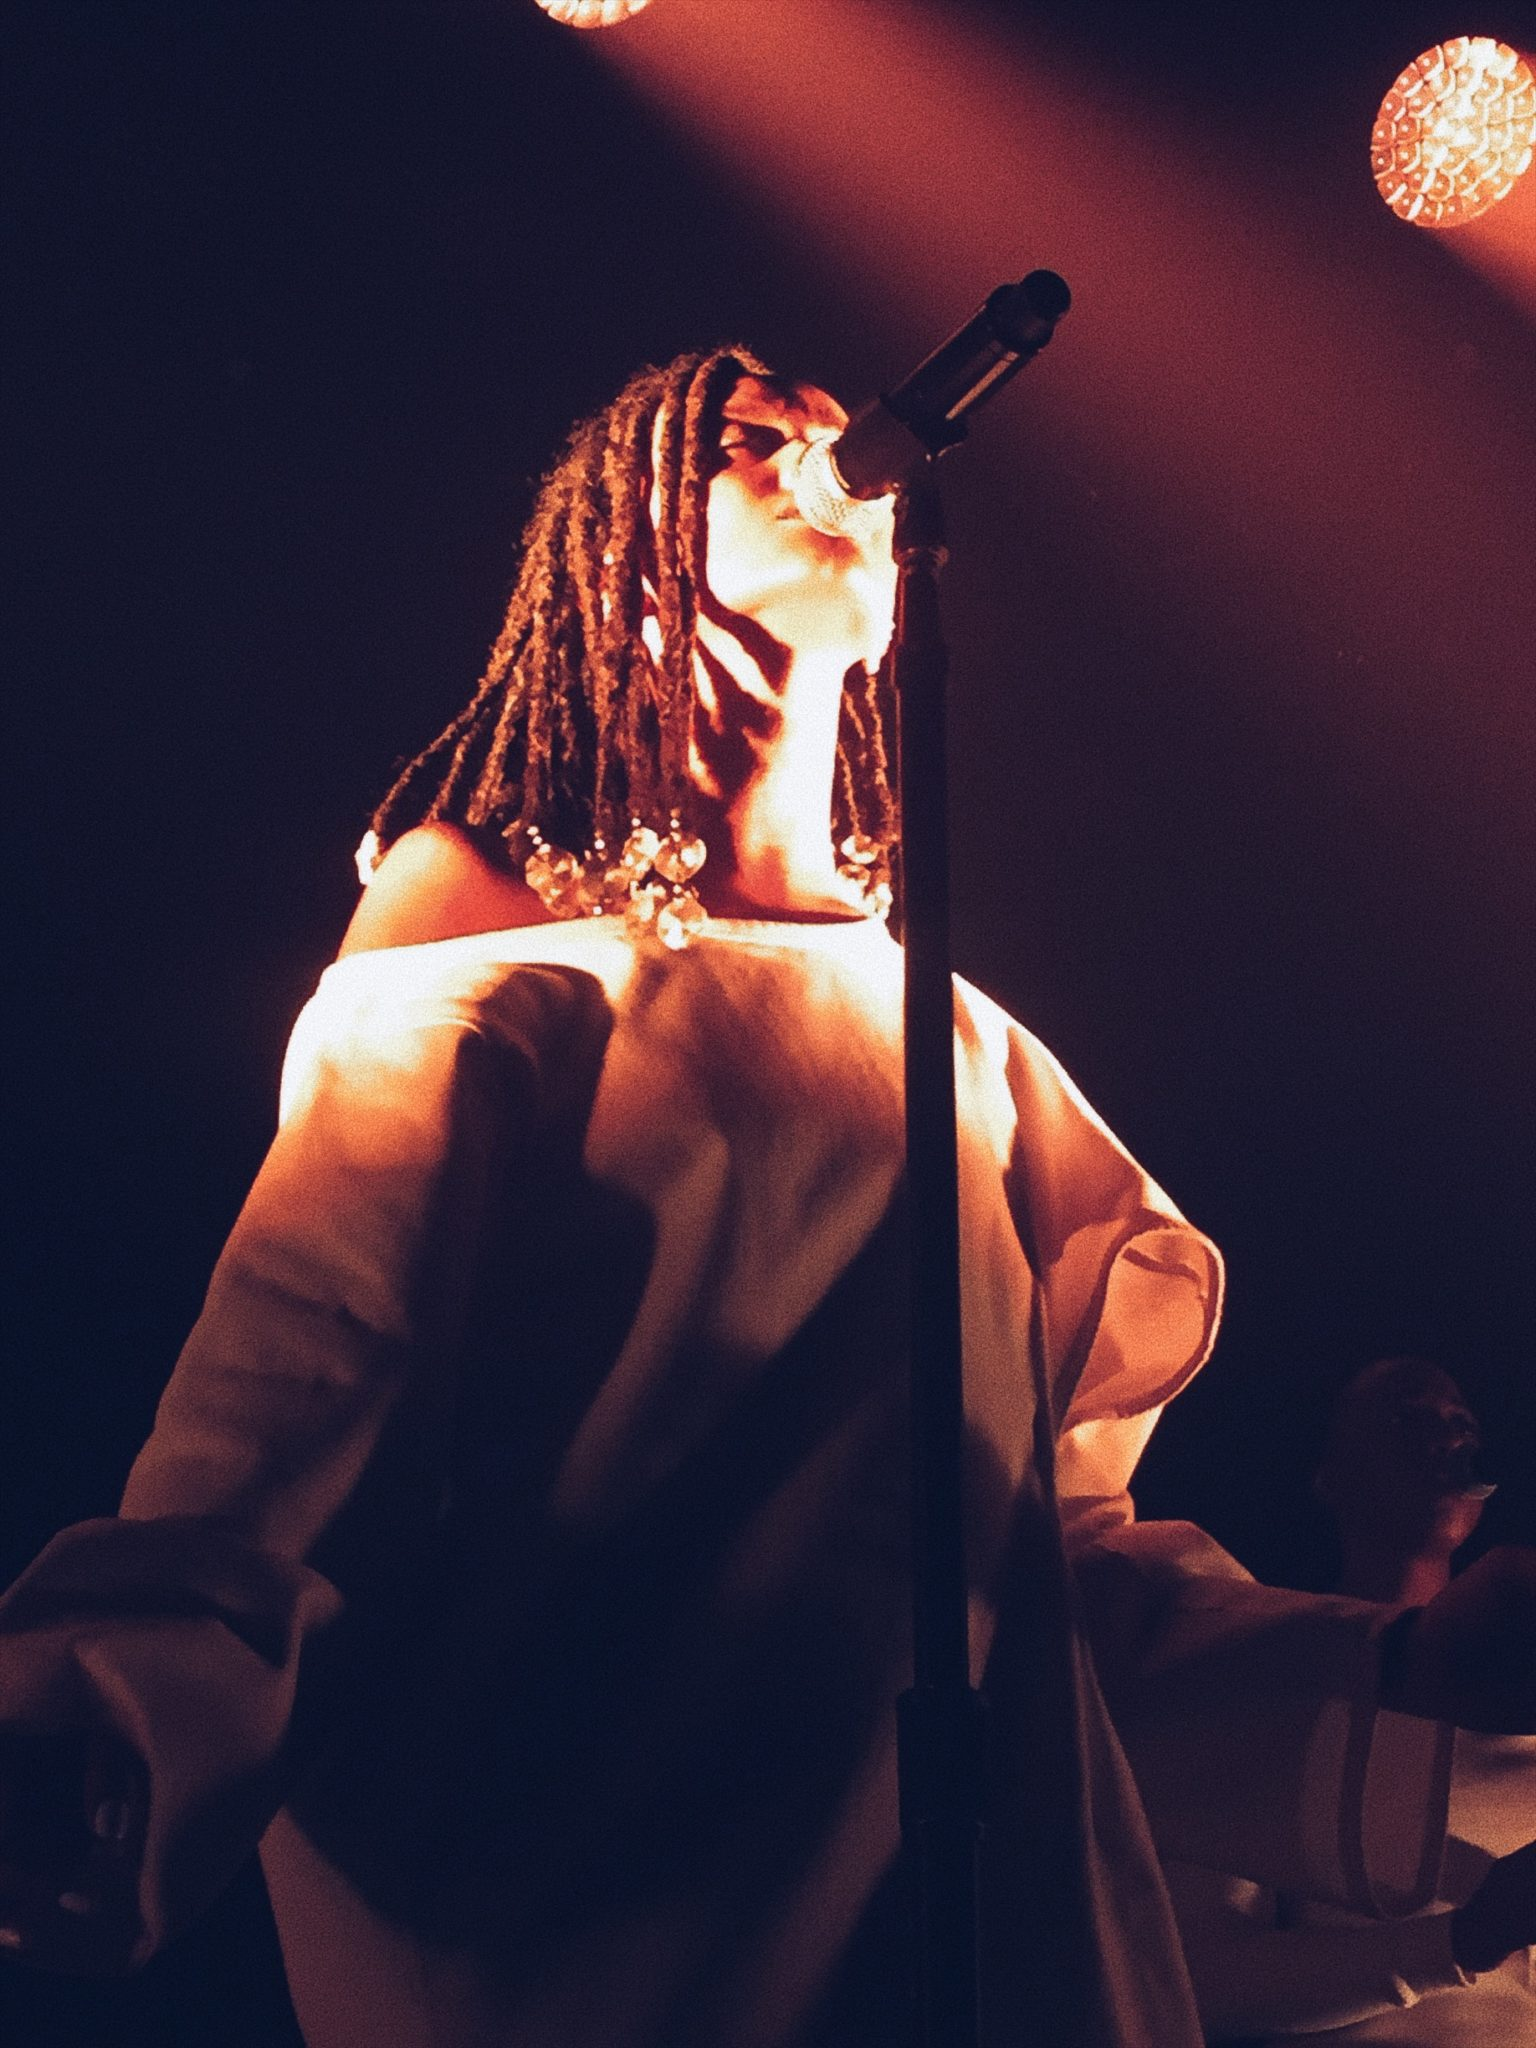 Concert Review: Kelela